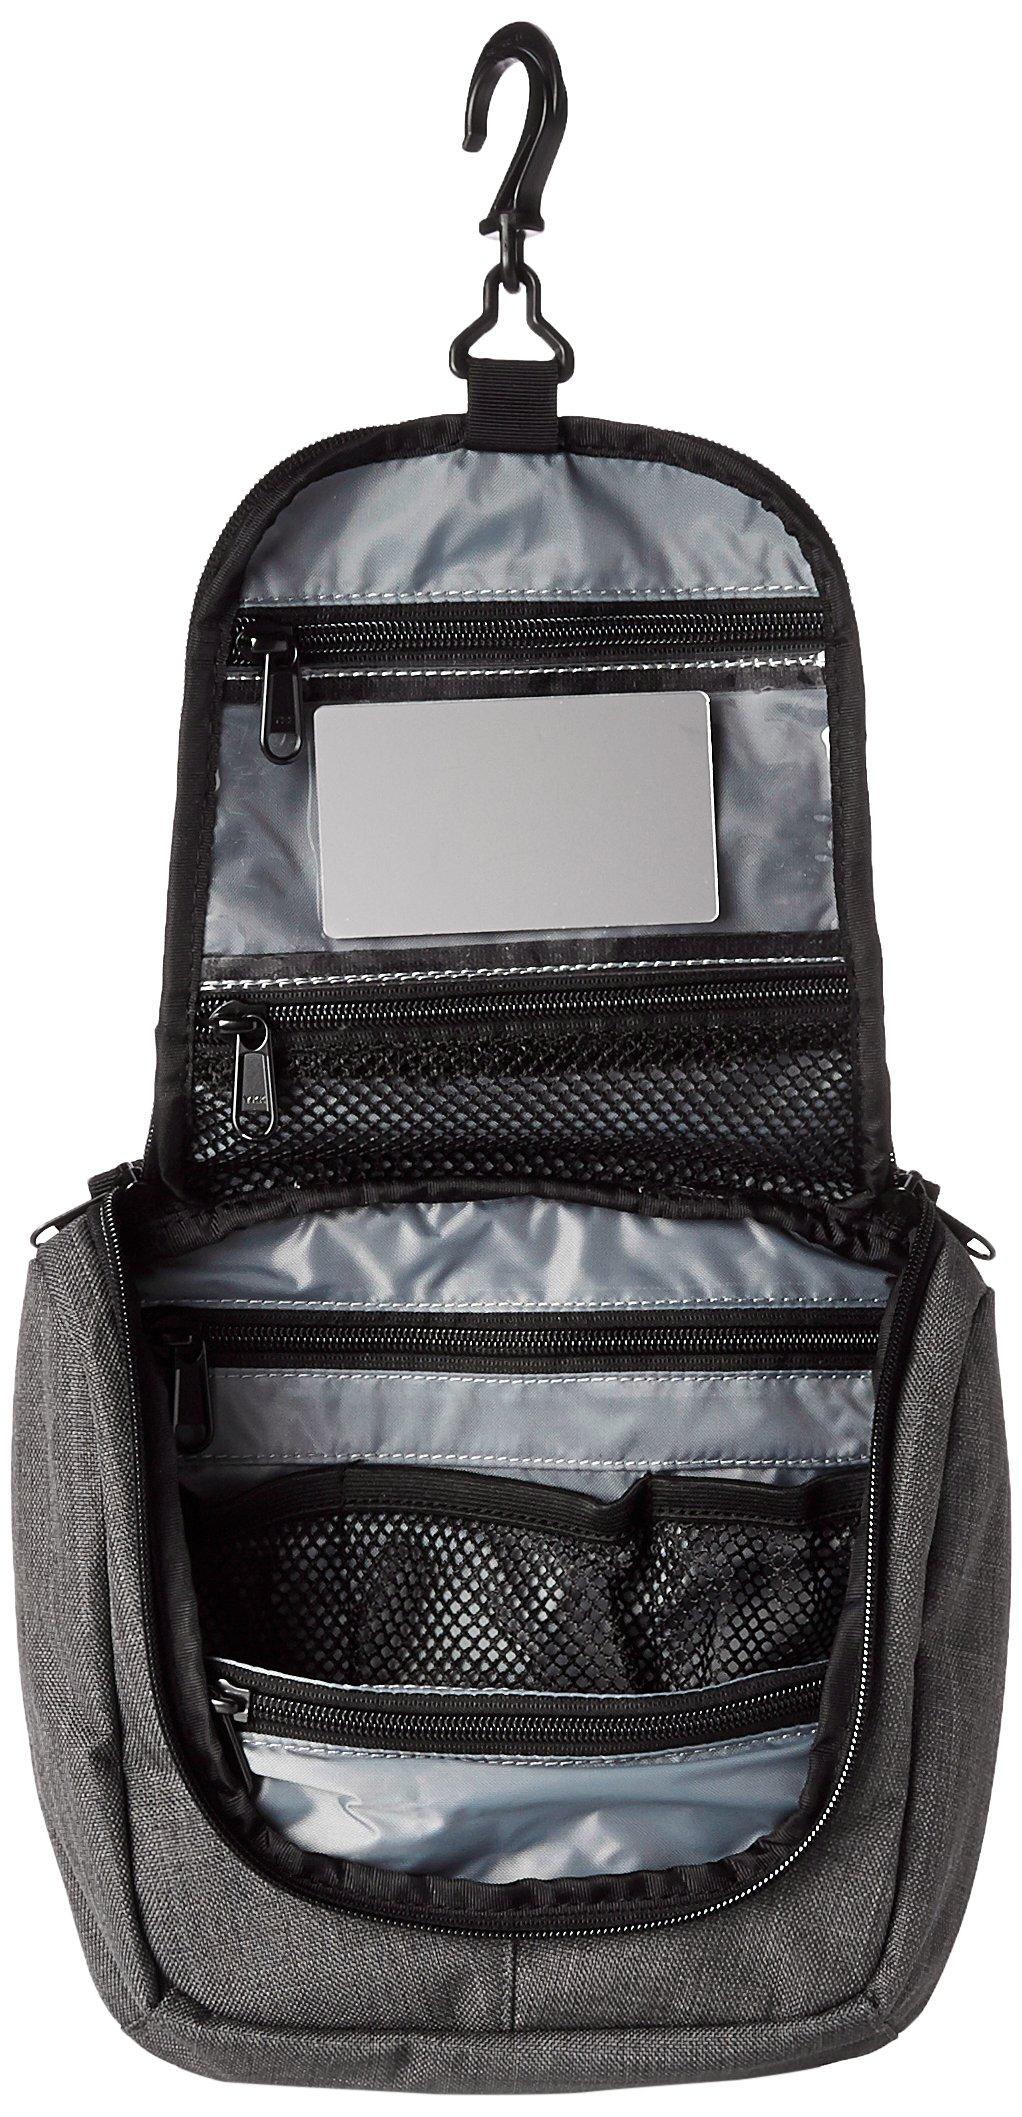 Dakine Travel Kit Toiletry Bag, One Size, Carbon by Dakine (Image #6)